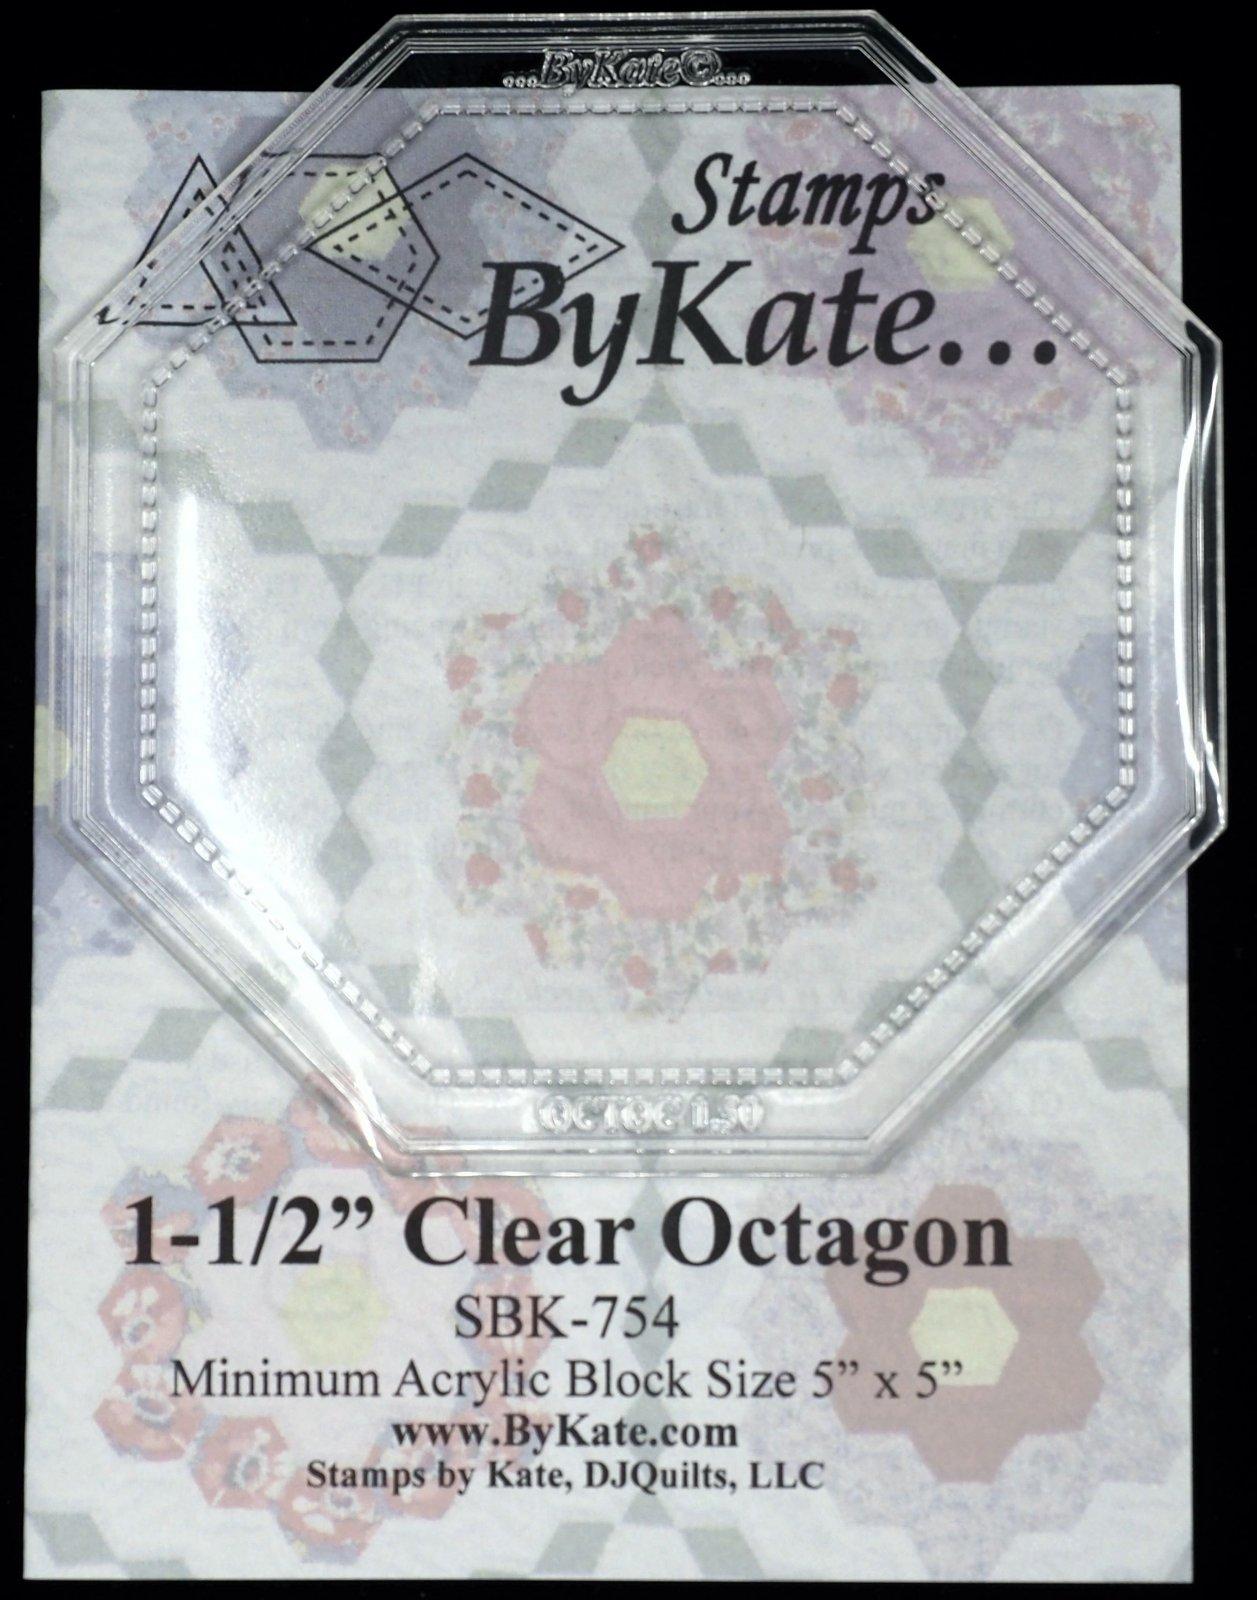 Clear Octagon 1-1/2 inch